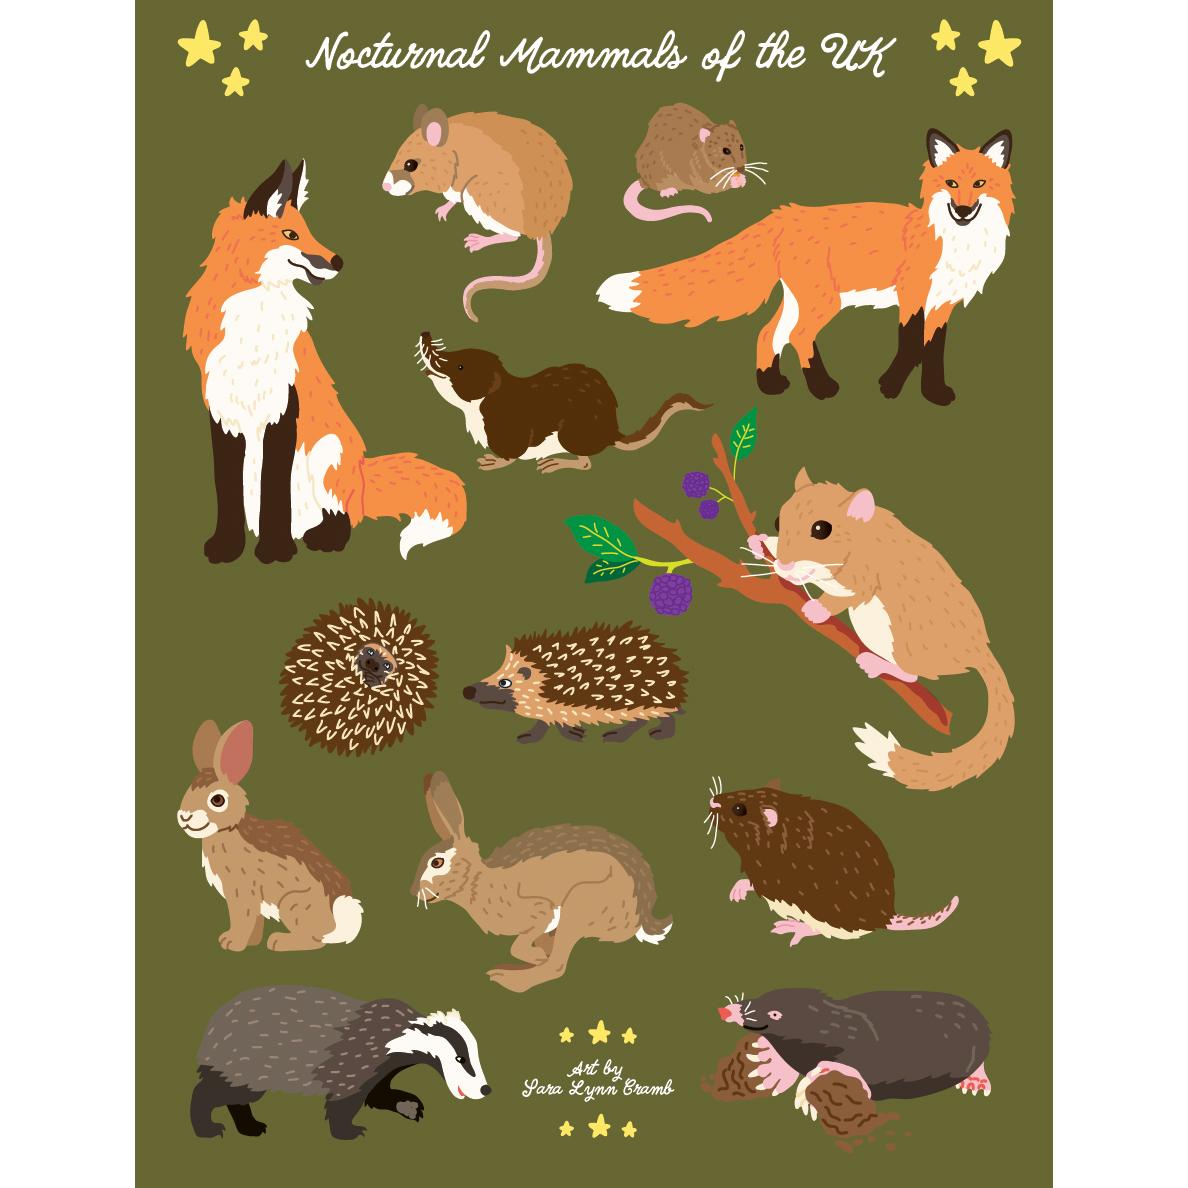 Nocturnal Mammals